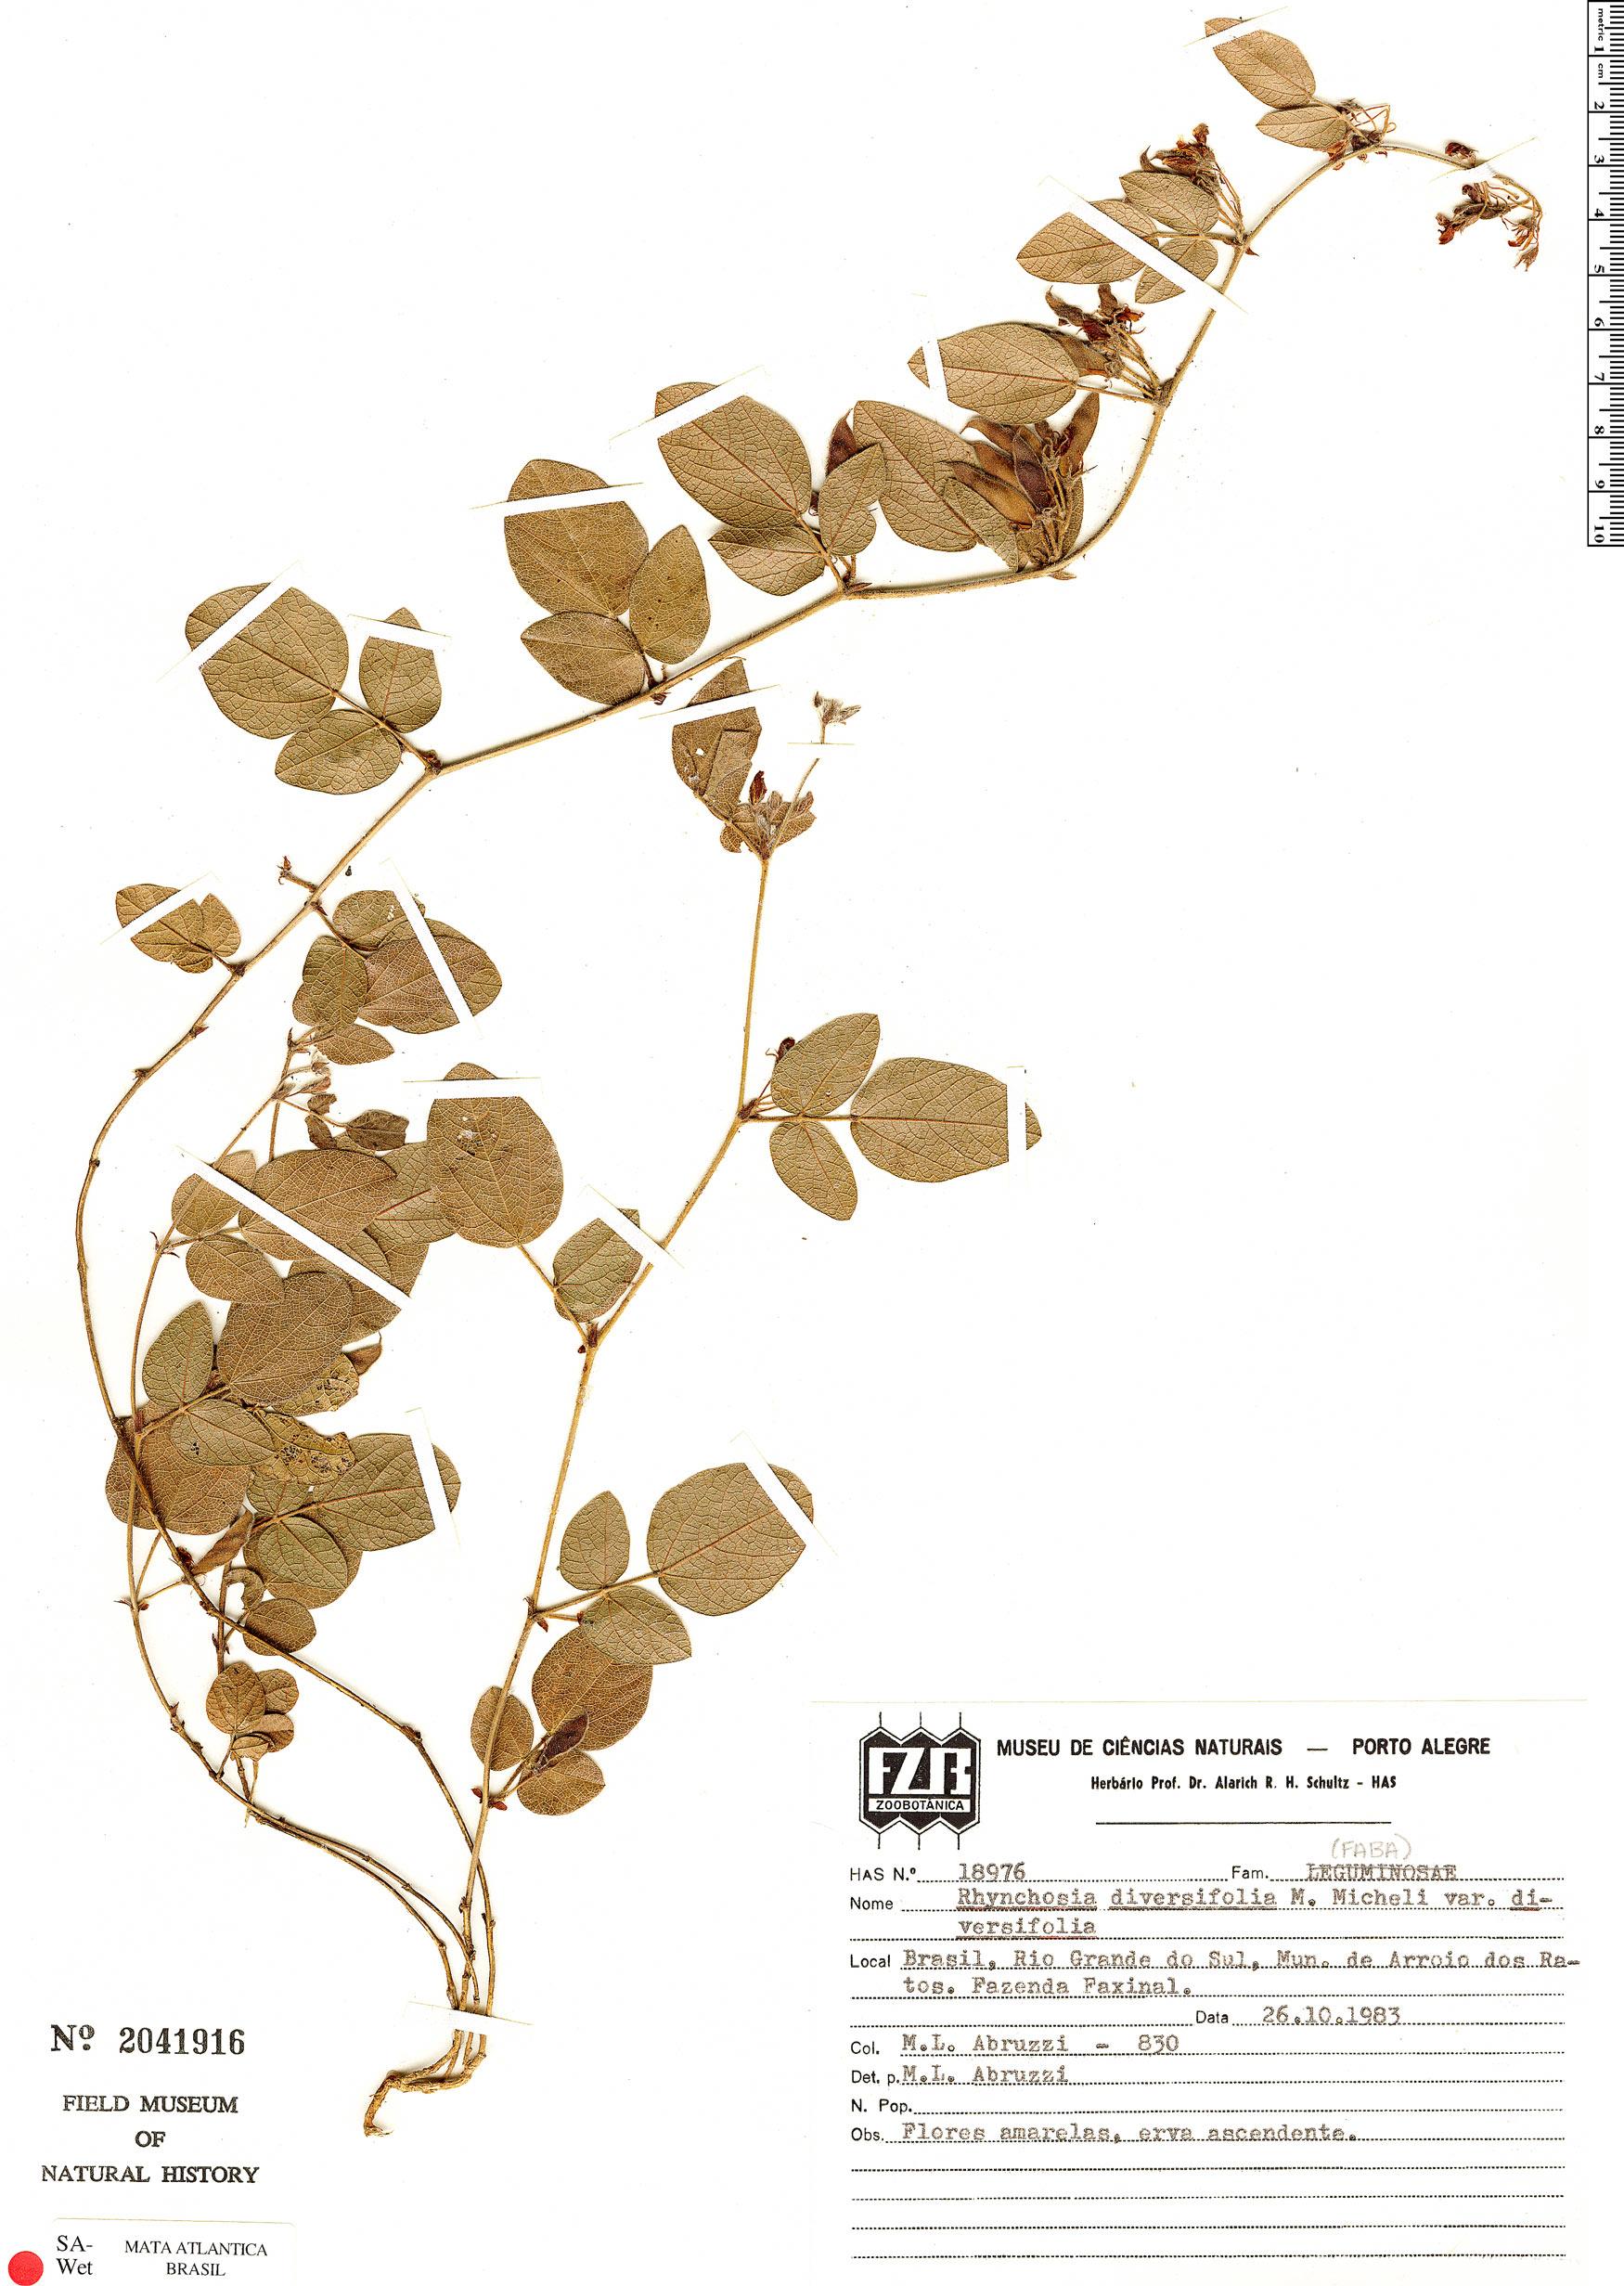 Espécime: Rhynchosia diversifolia